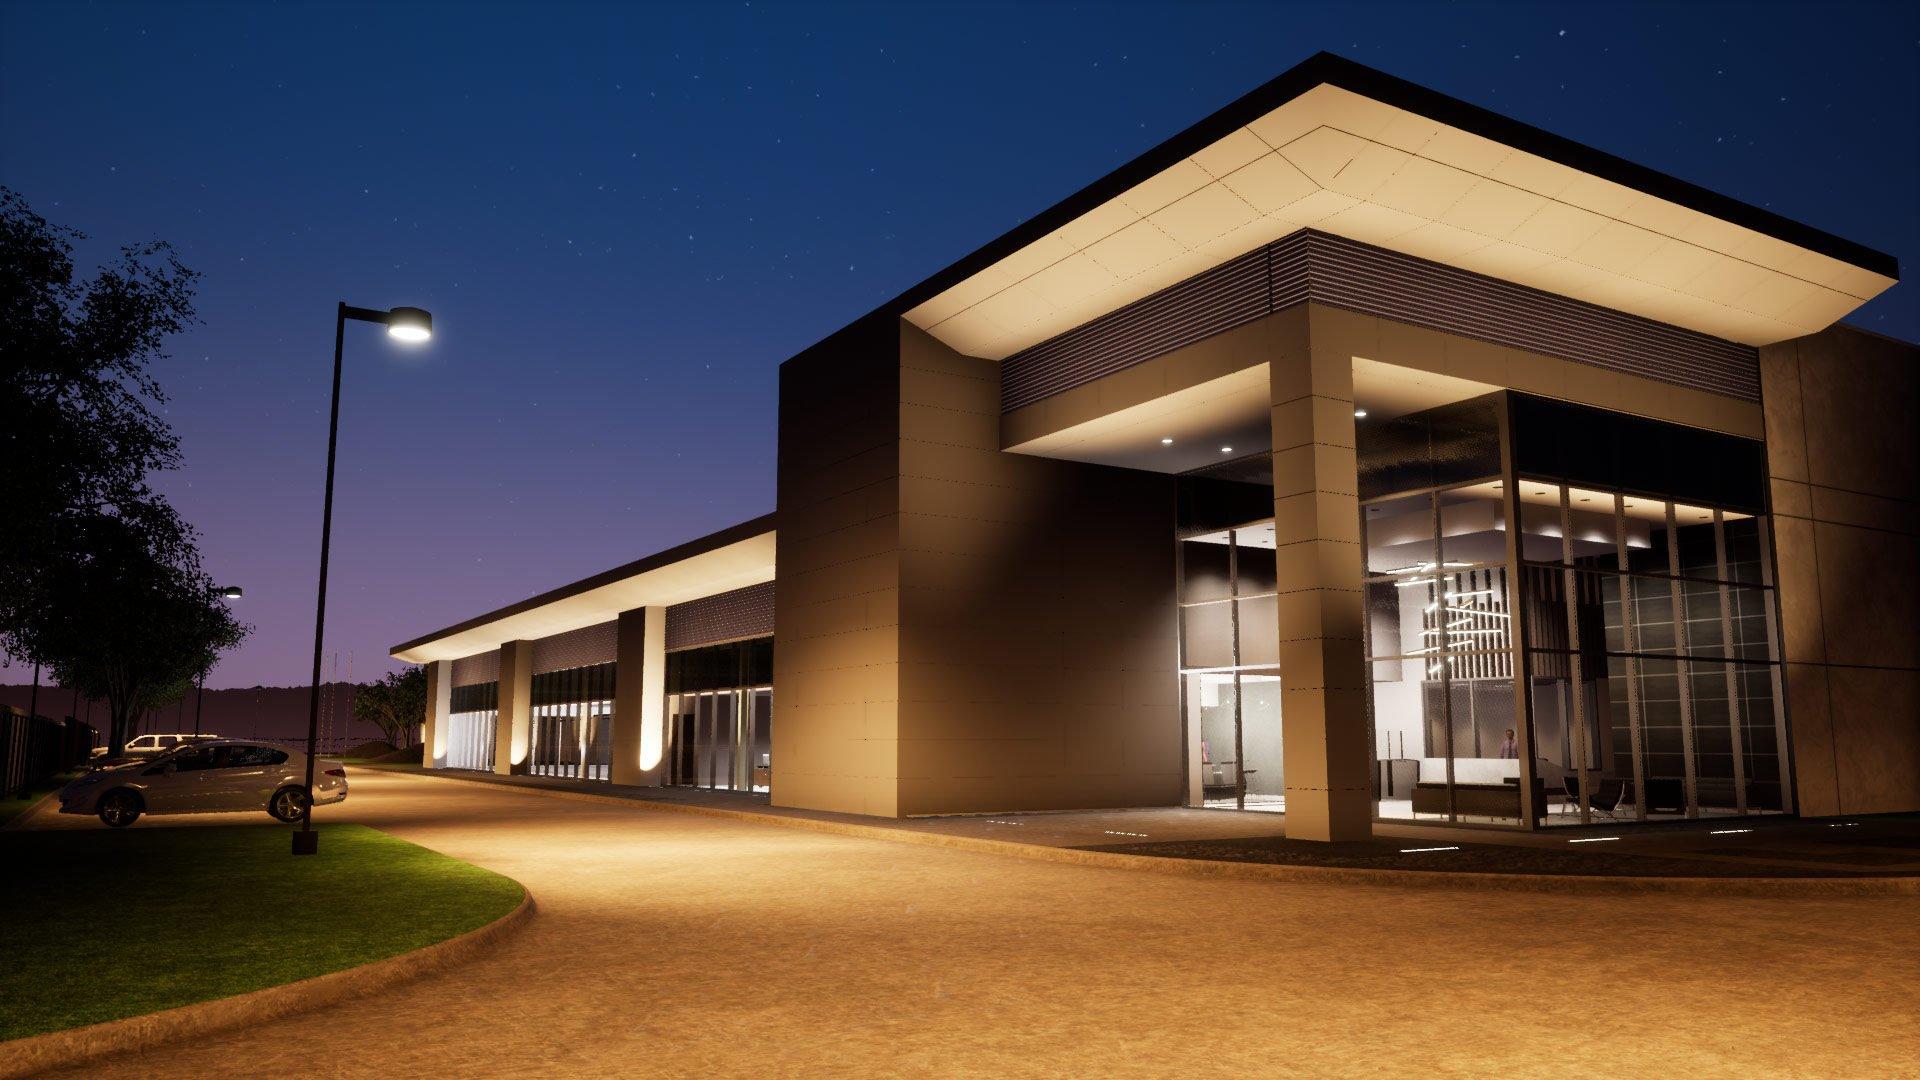 Stream Data Centers DFW VII Hyperscale Facility in the Dallas Market